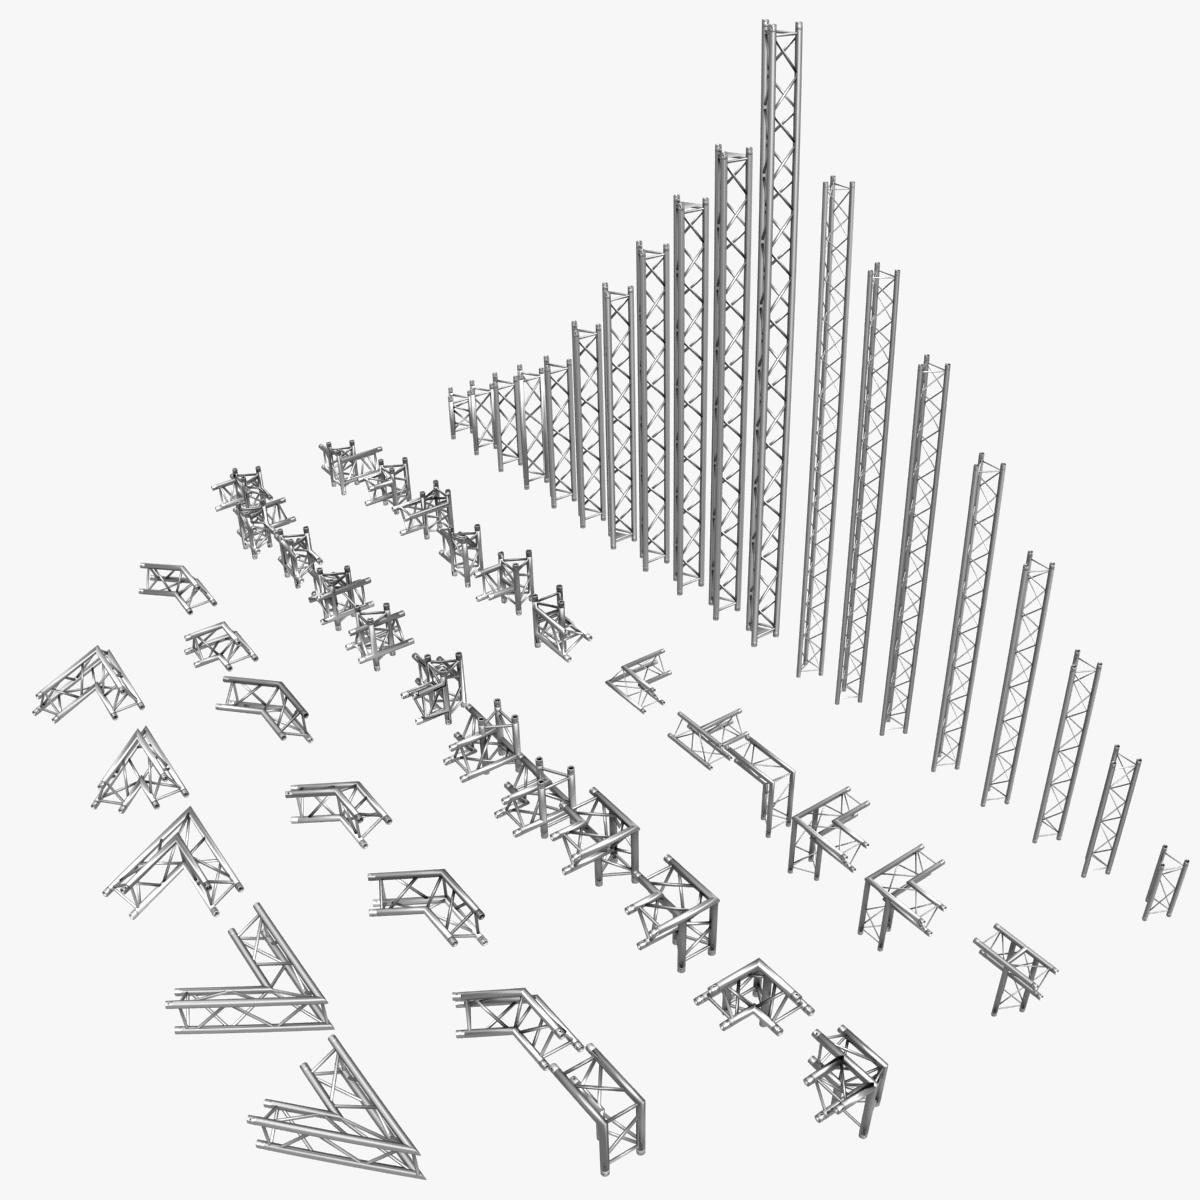 triangular trusses (collection 55 modular pieces) 3d model 3ds max dxf fbx c4d dae texture obj 216209